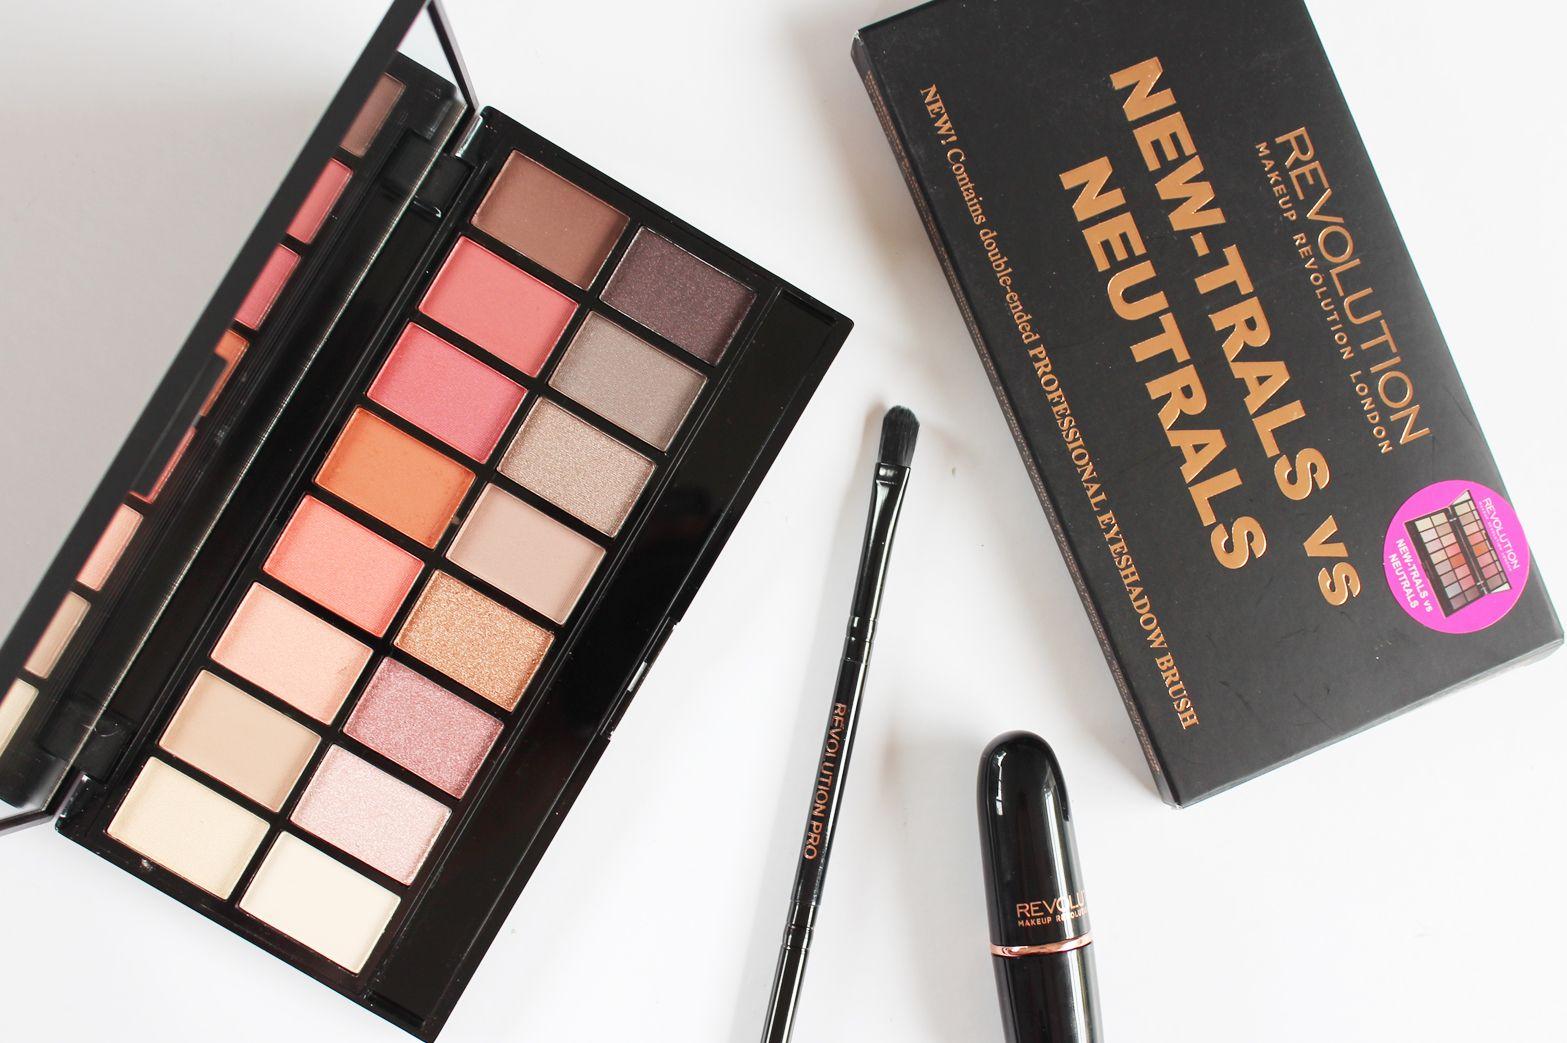 MAKEUP REVOLUTION Makeup revolution, Eyeshadow palette